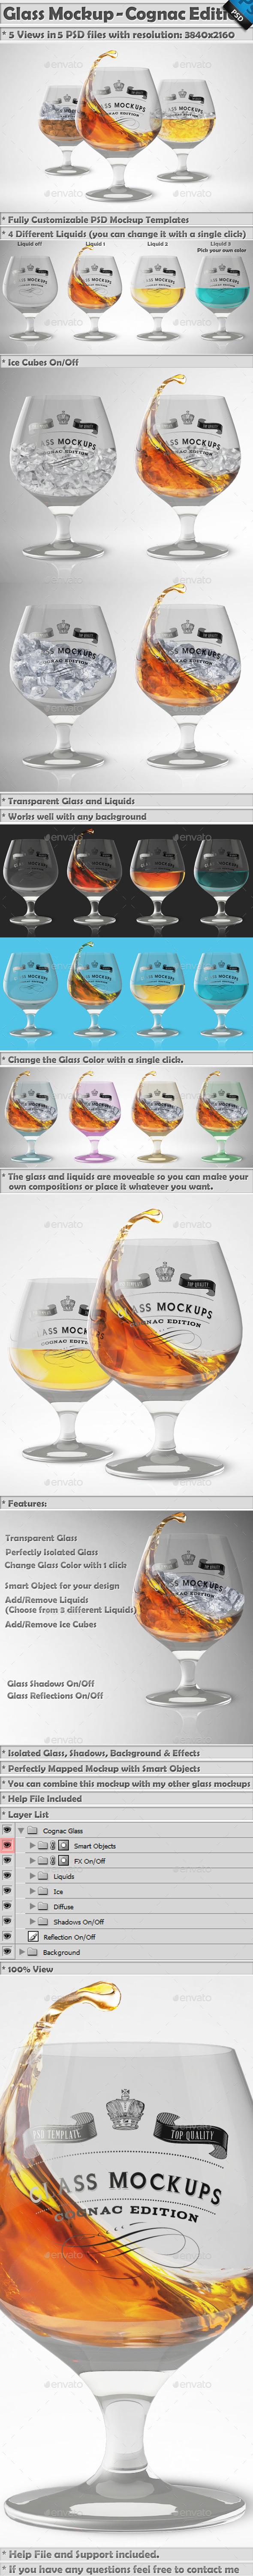 Glass Mockup - Cognac Glass Mockup Volume 2  - Miscellaneous Print